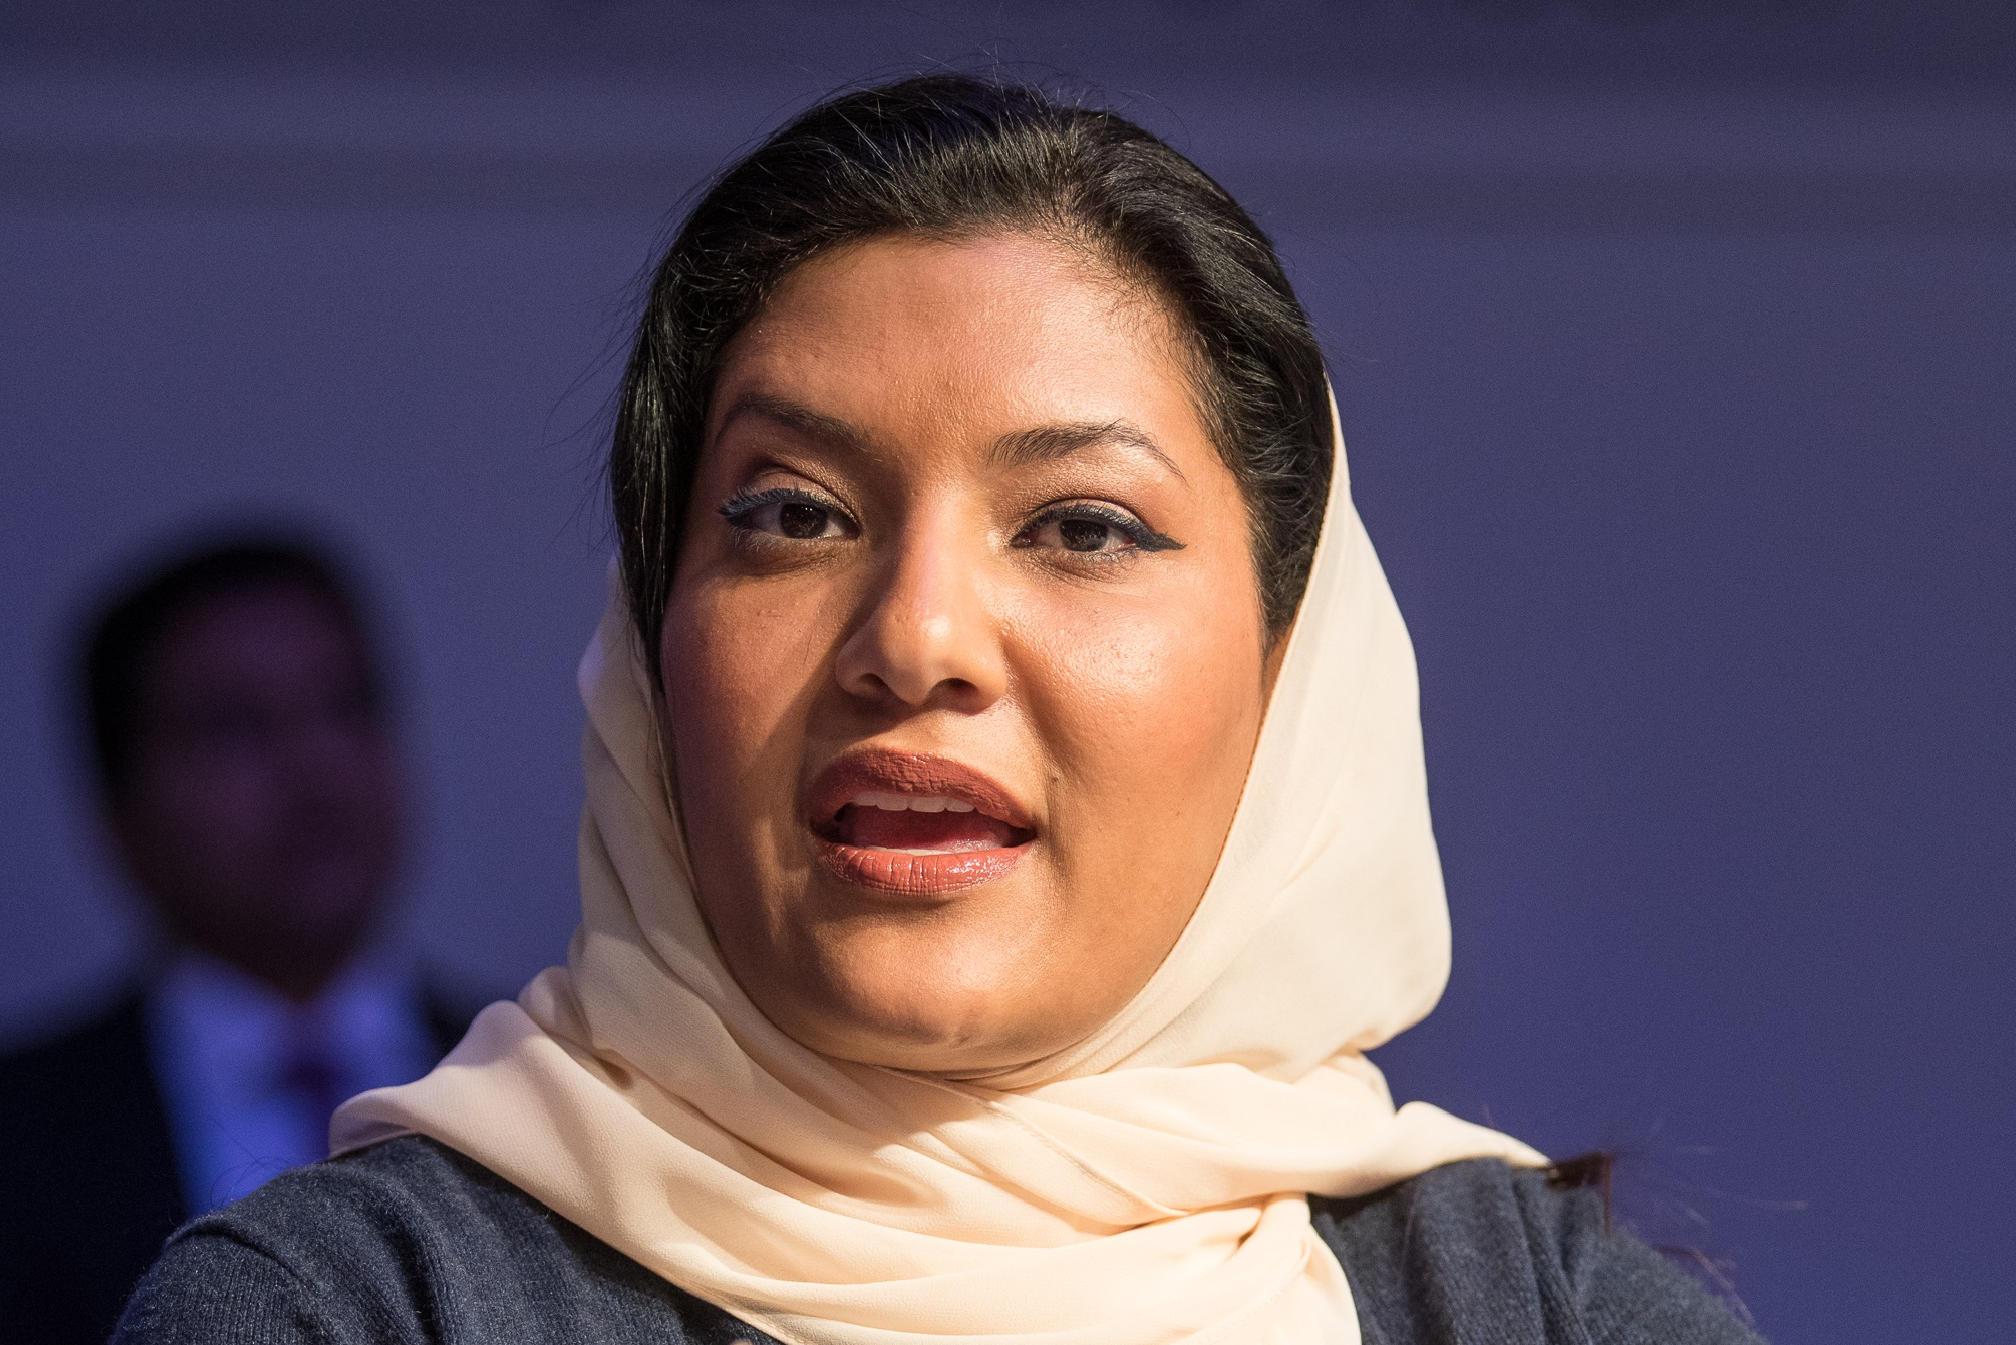 he kingdom has just appointed Princess Reema bint Bandar as the country's ambassador in Washington, USA © World Economic Forum / Boris Baldinger